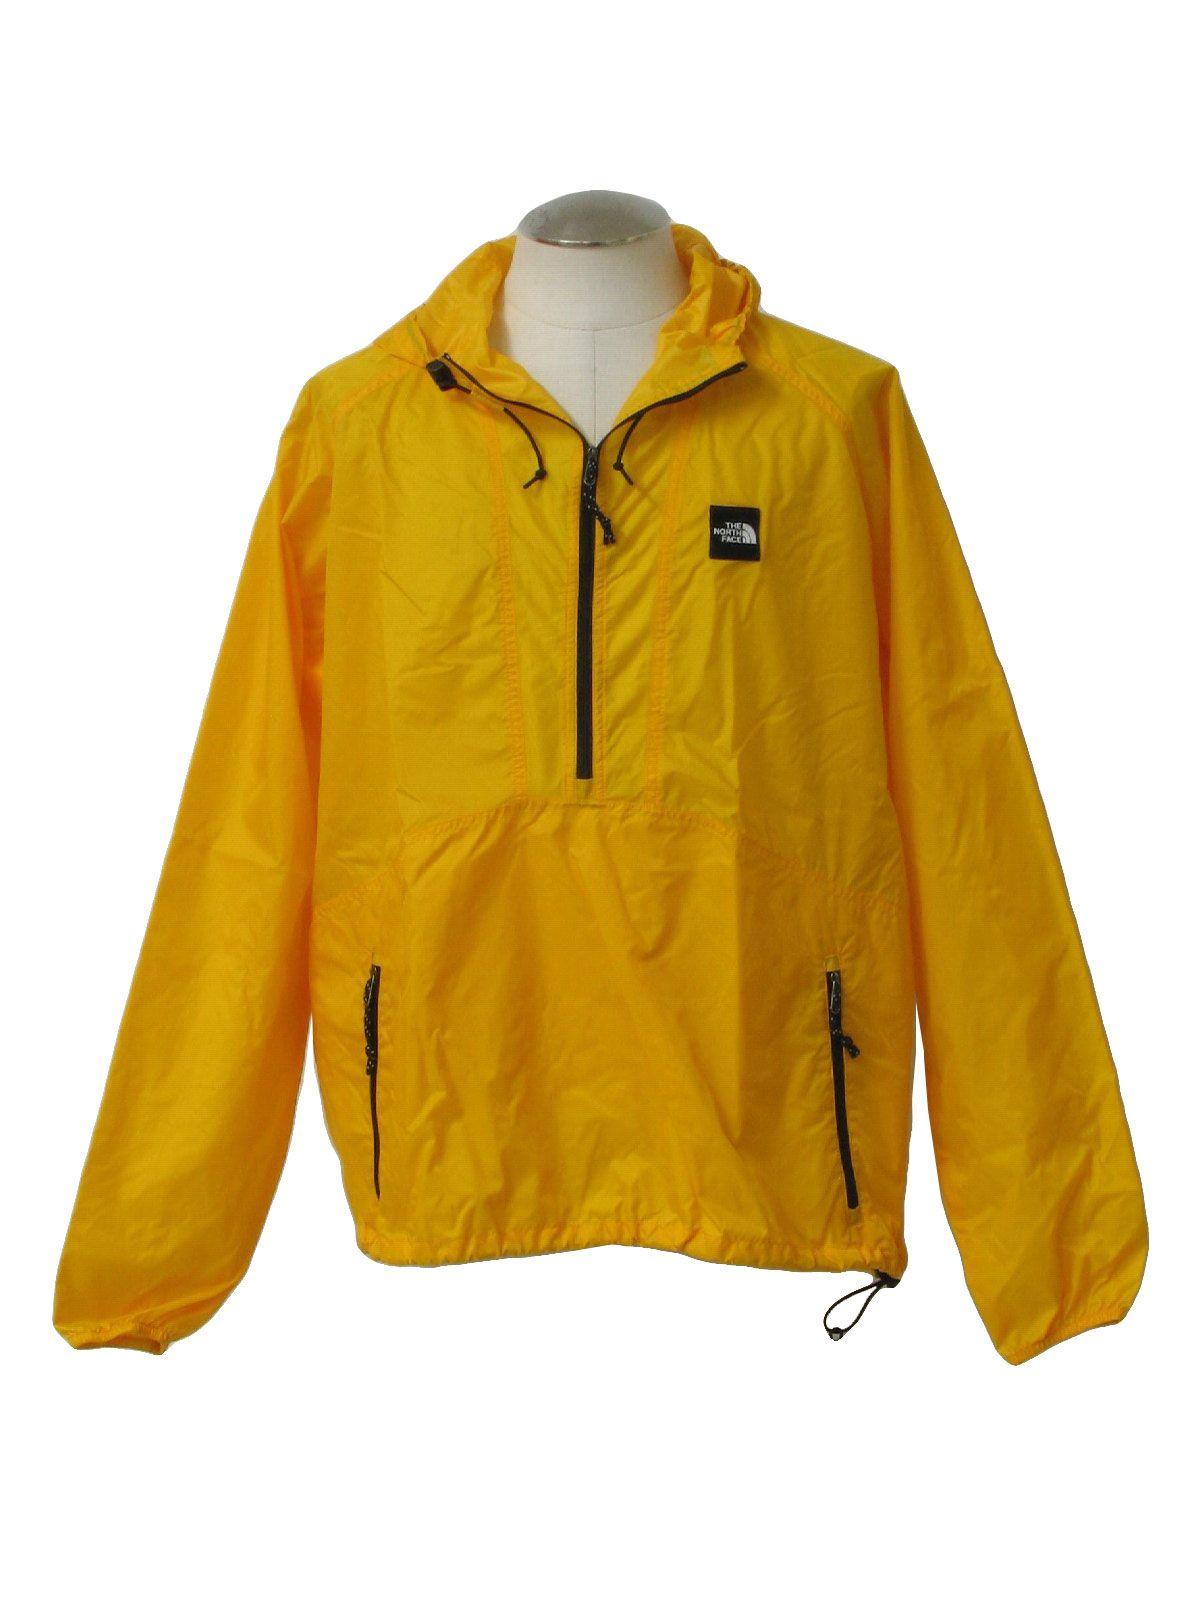 2b8e9da7f 90s -North Face- Unisex sunflower yellow nylon windbreaker tall size ...